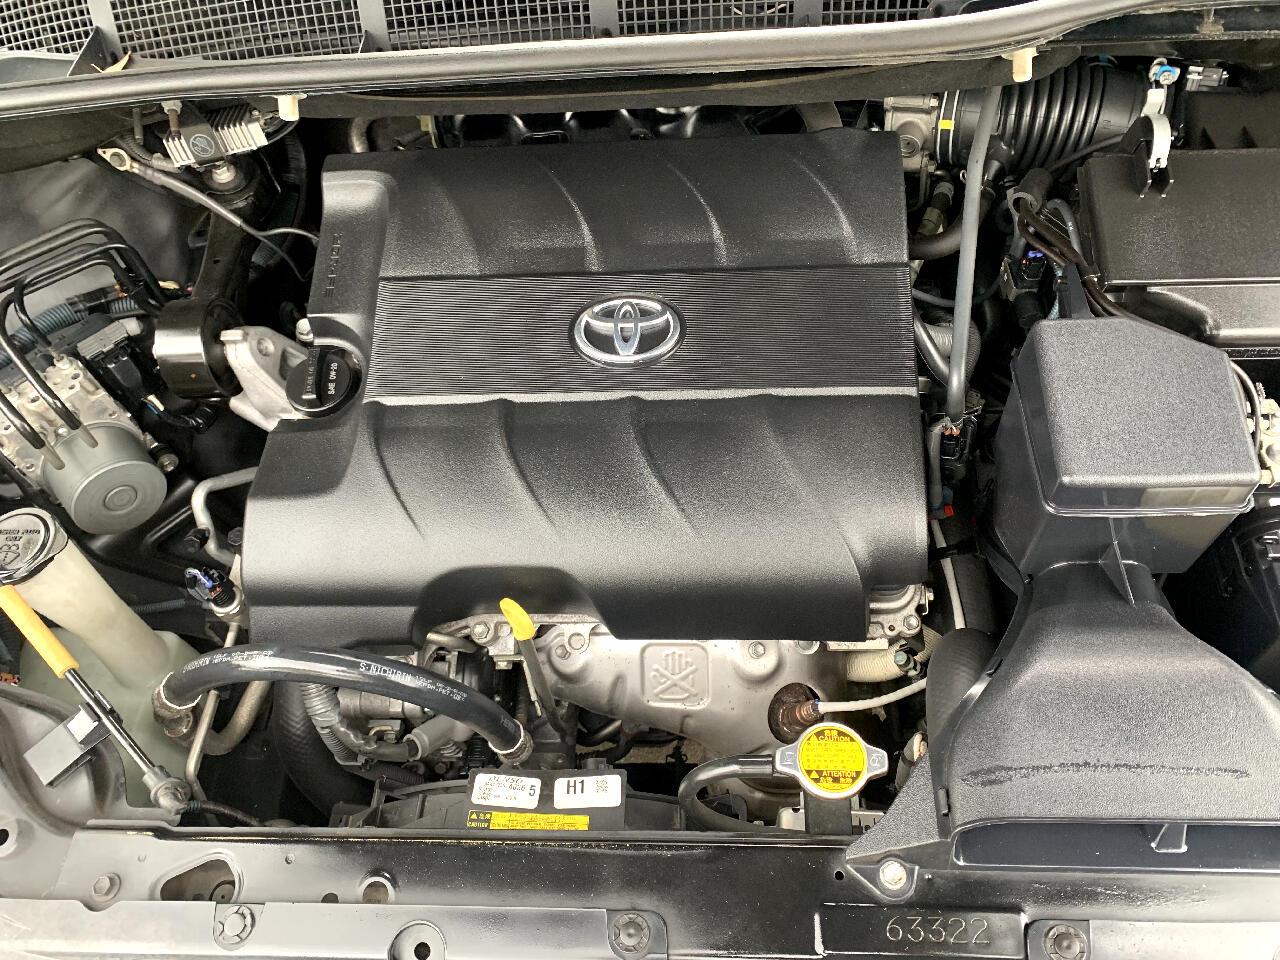 2014 Toyota Sienna 5dr 8-Pass Van V6 SE FWD (Natl)